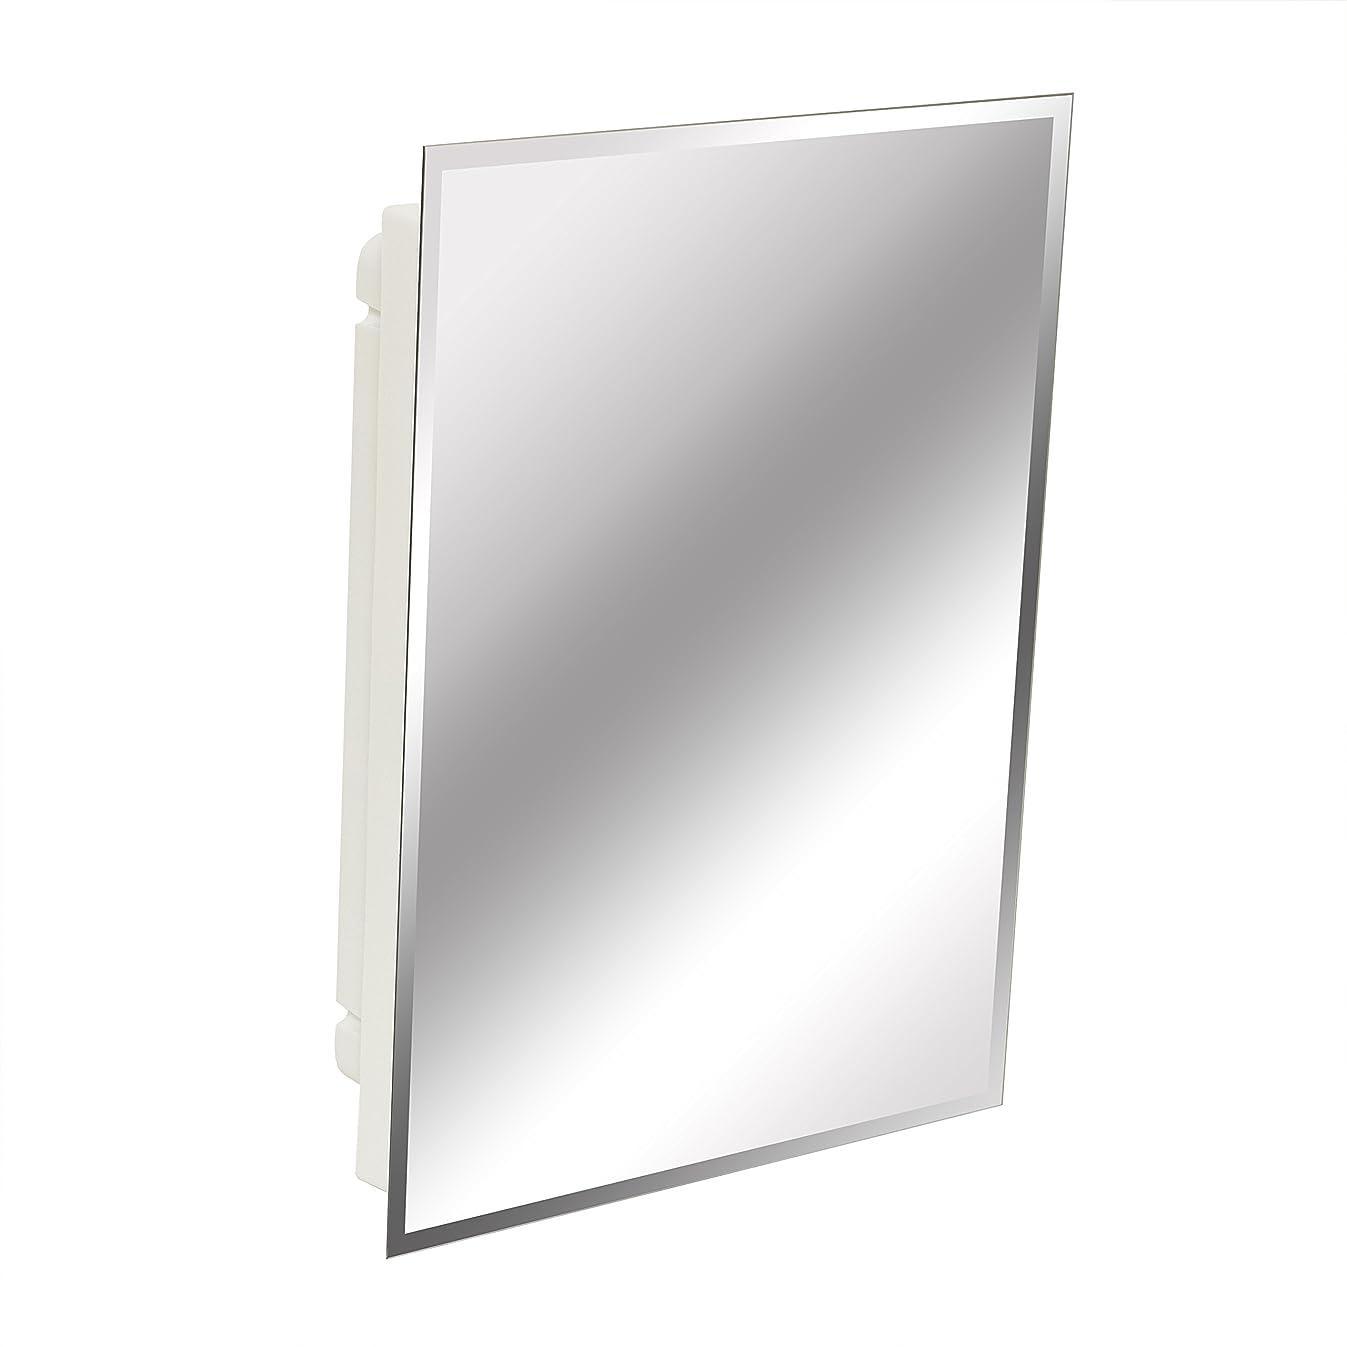 American Pride 9622WBAR12 – Recessed Frameless Beveled Polished Edge Mirror Medicine Cabinet 16